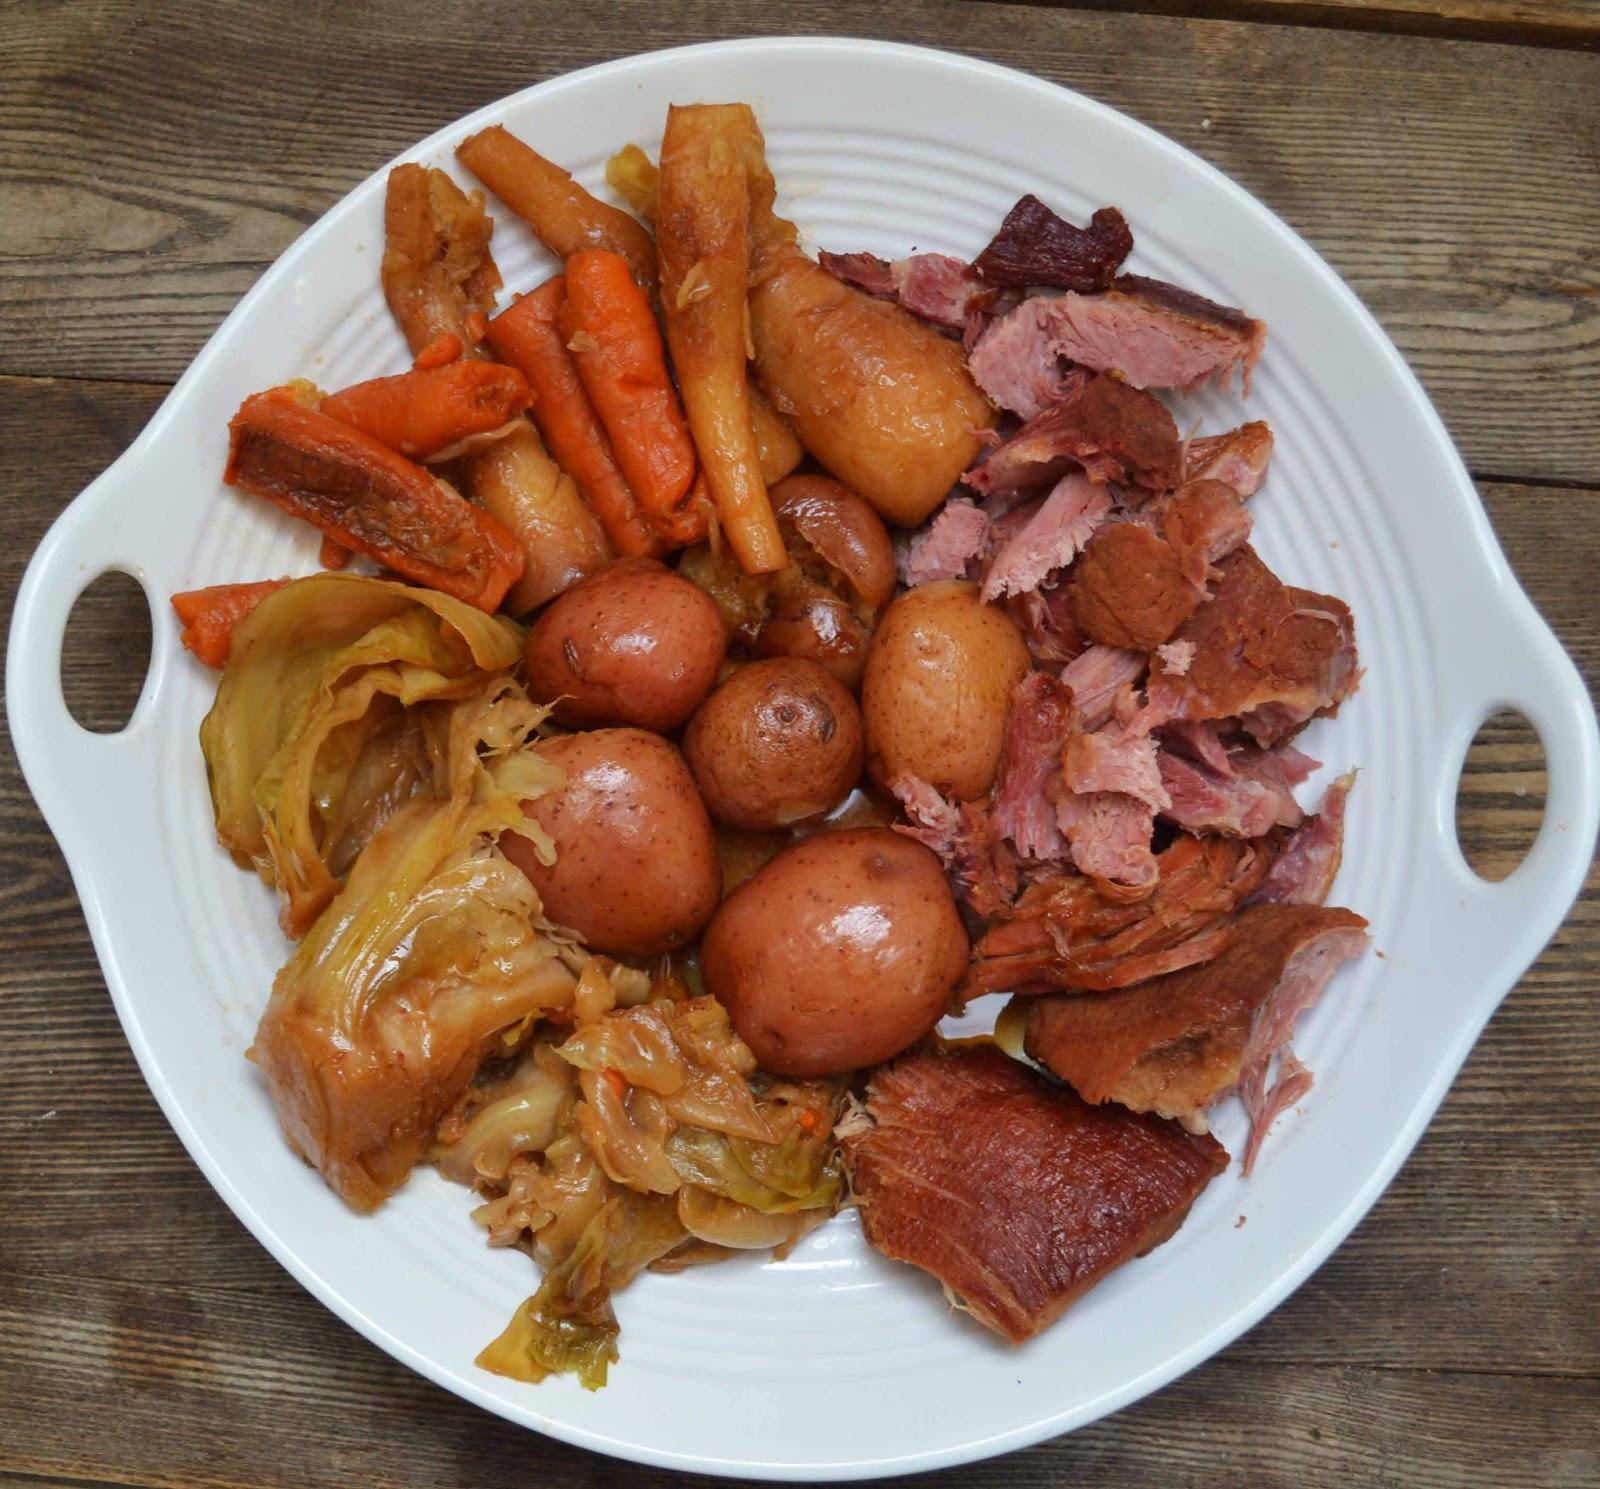 Boiled Dinner With Ham  New England Boiled Dinner Smoked Pork Shoulder Picnic Ham